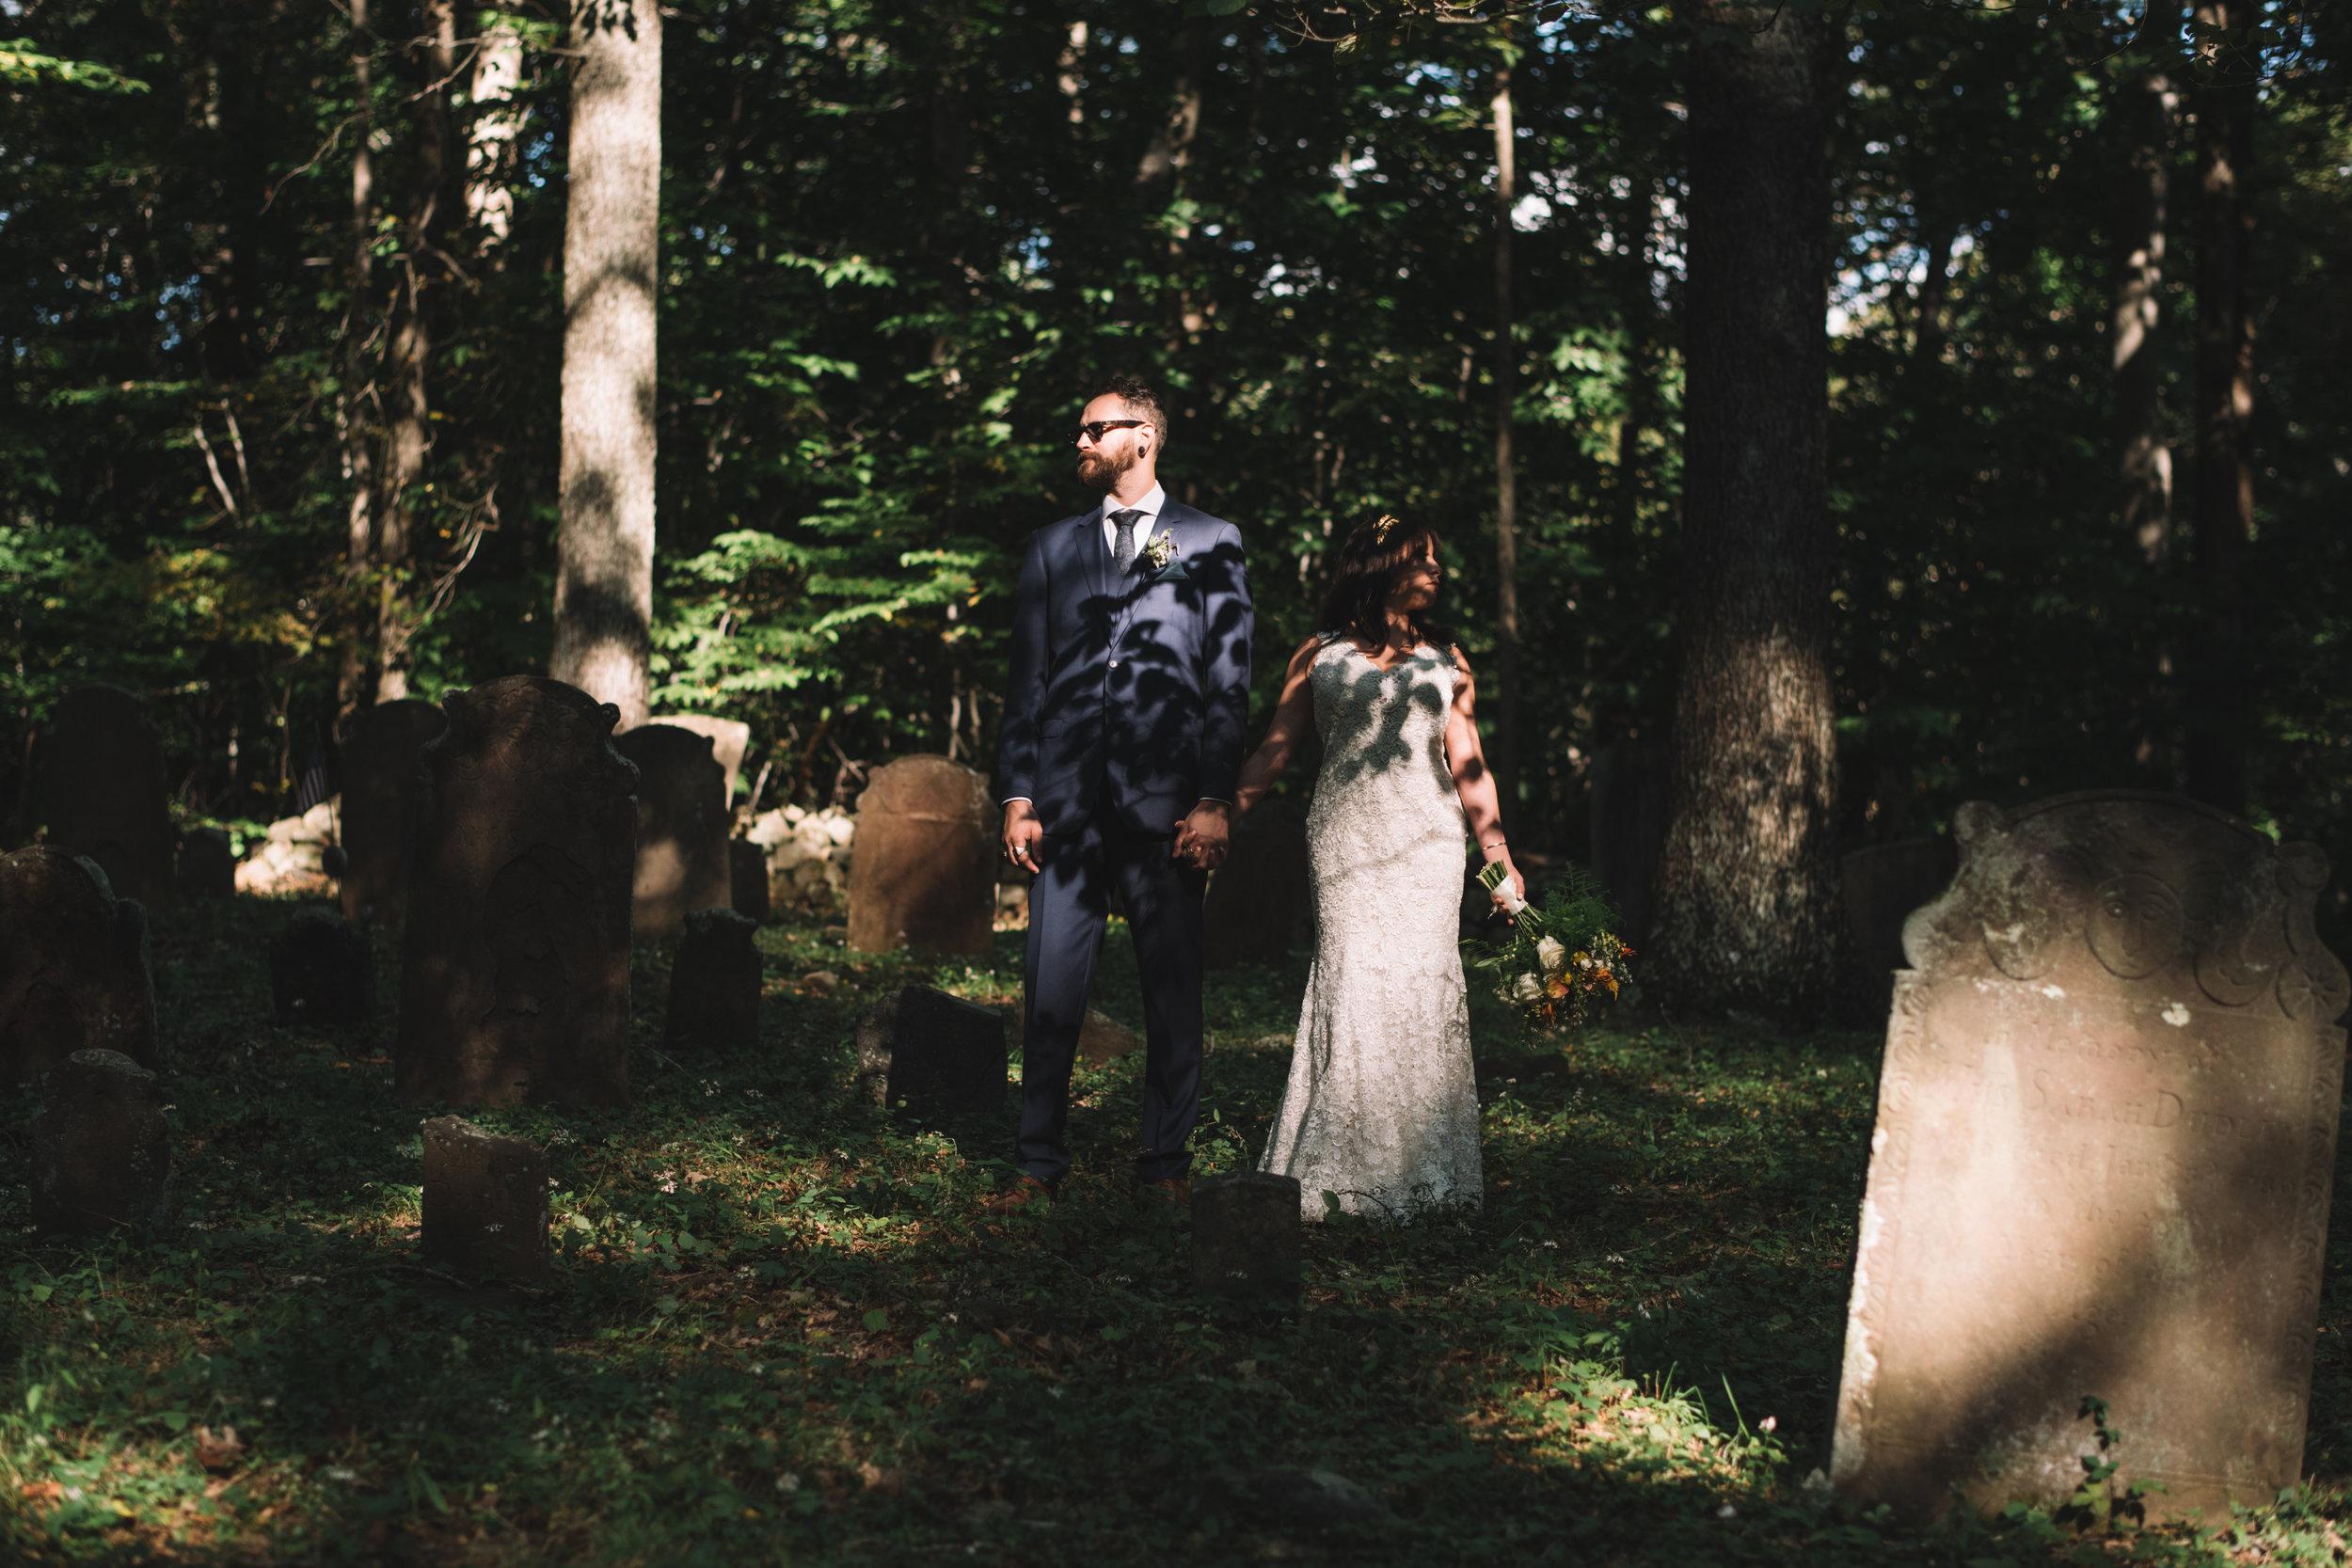 WeddingPhotos | NJPhotographer | Highlights-8-24.jpg